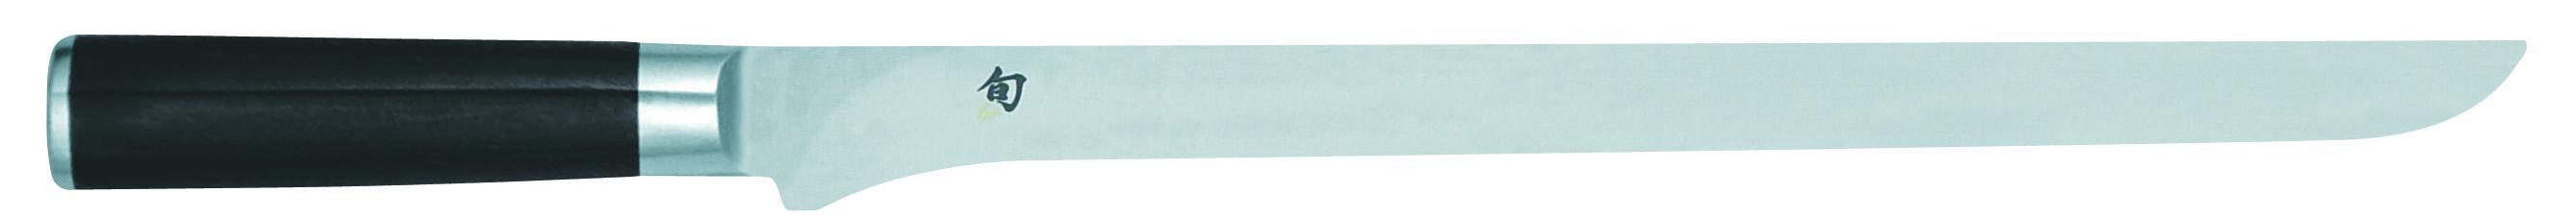 Flexibilný nôž na šunku Shun DM-0735